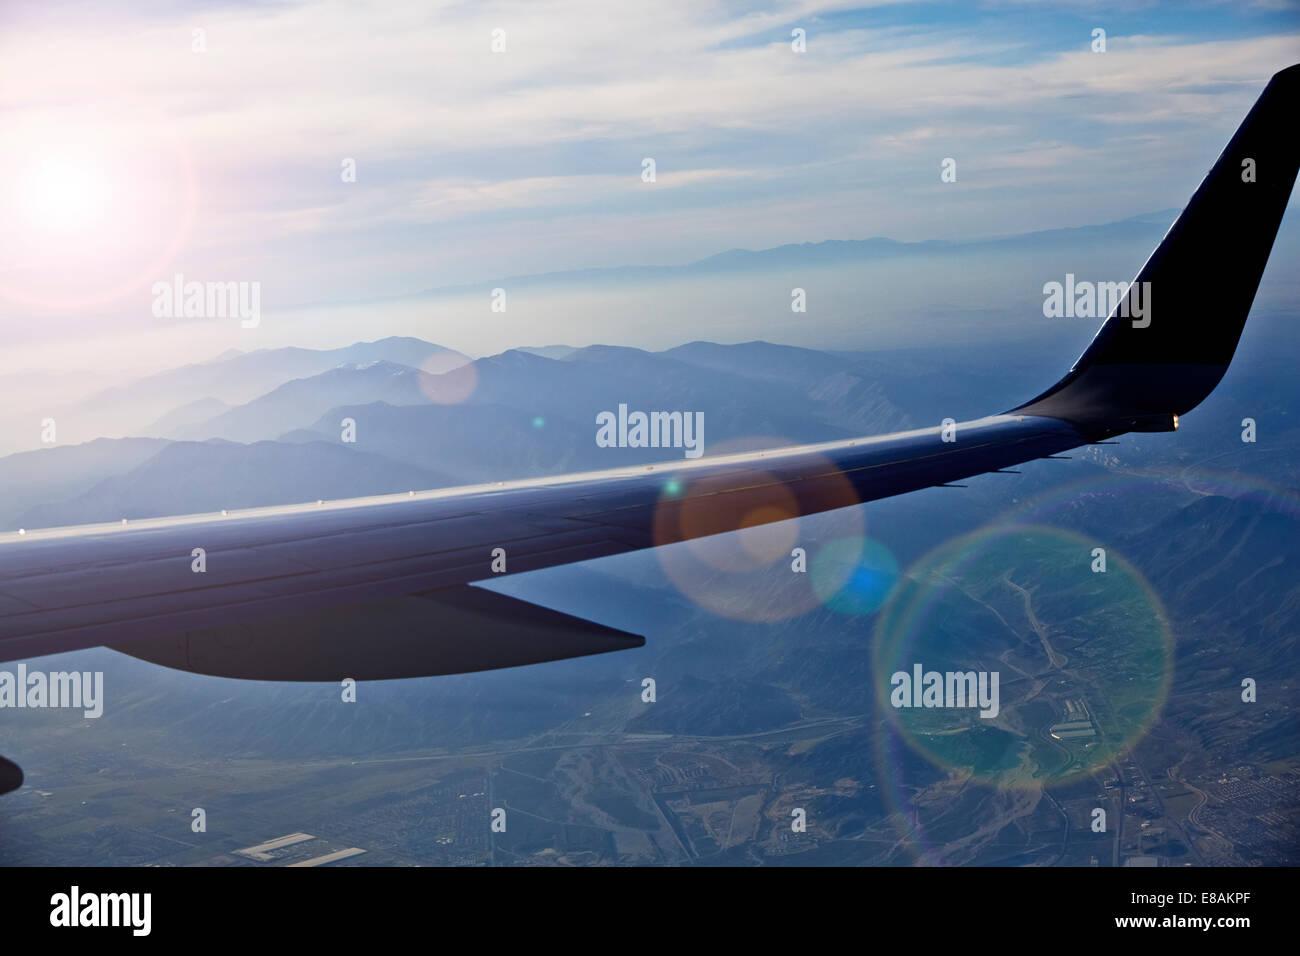 Aeroplane wing flying over landscape - Stock Image